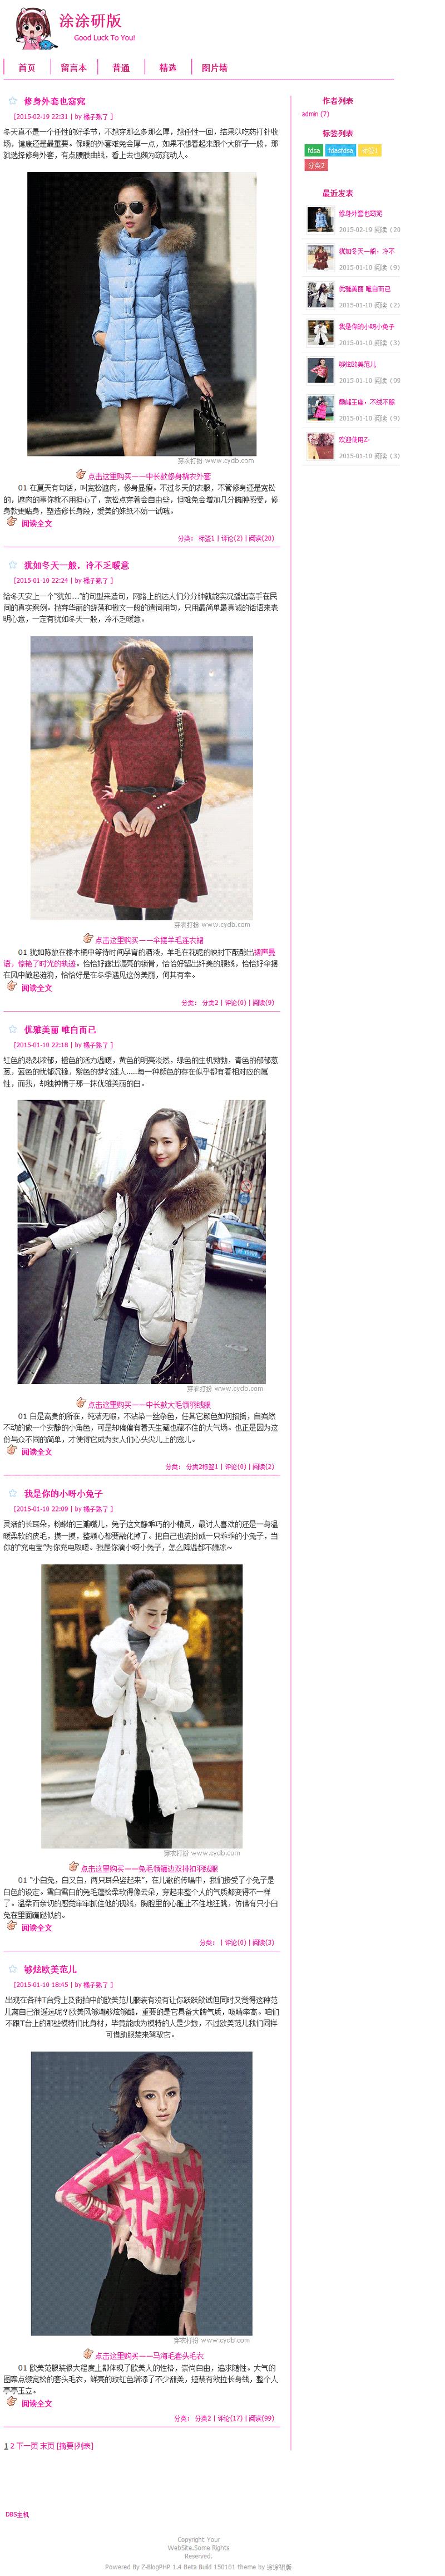 火狐截图_2015-01-13T13-16-38.png